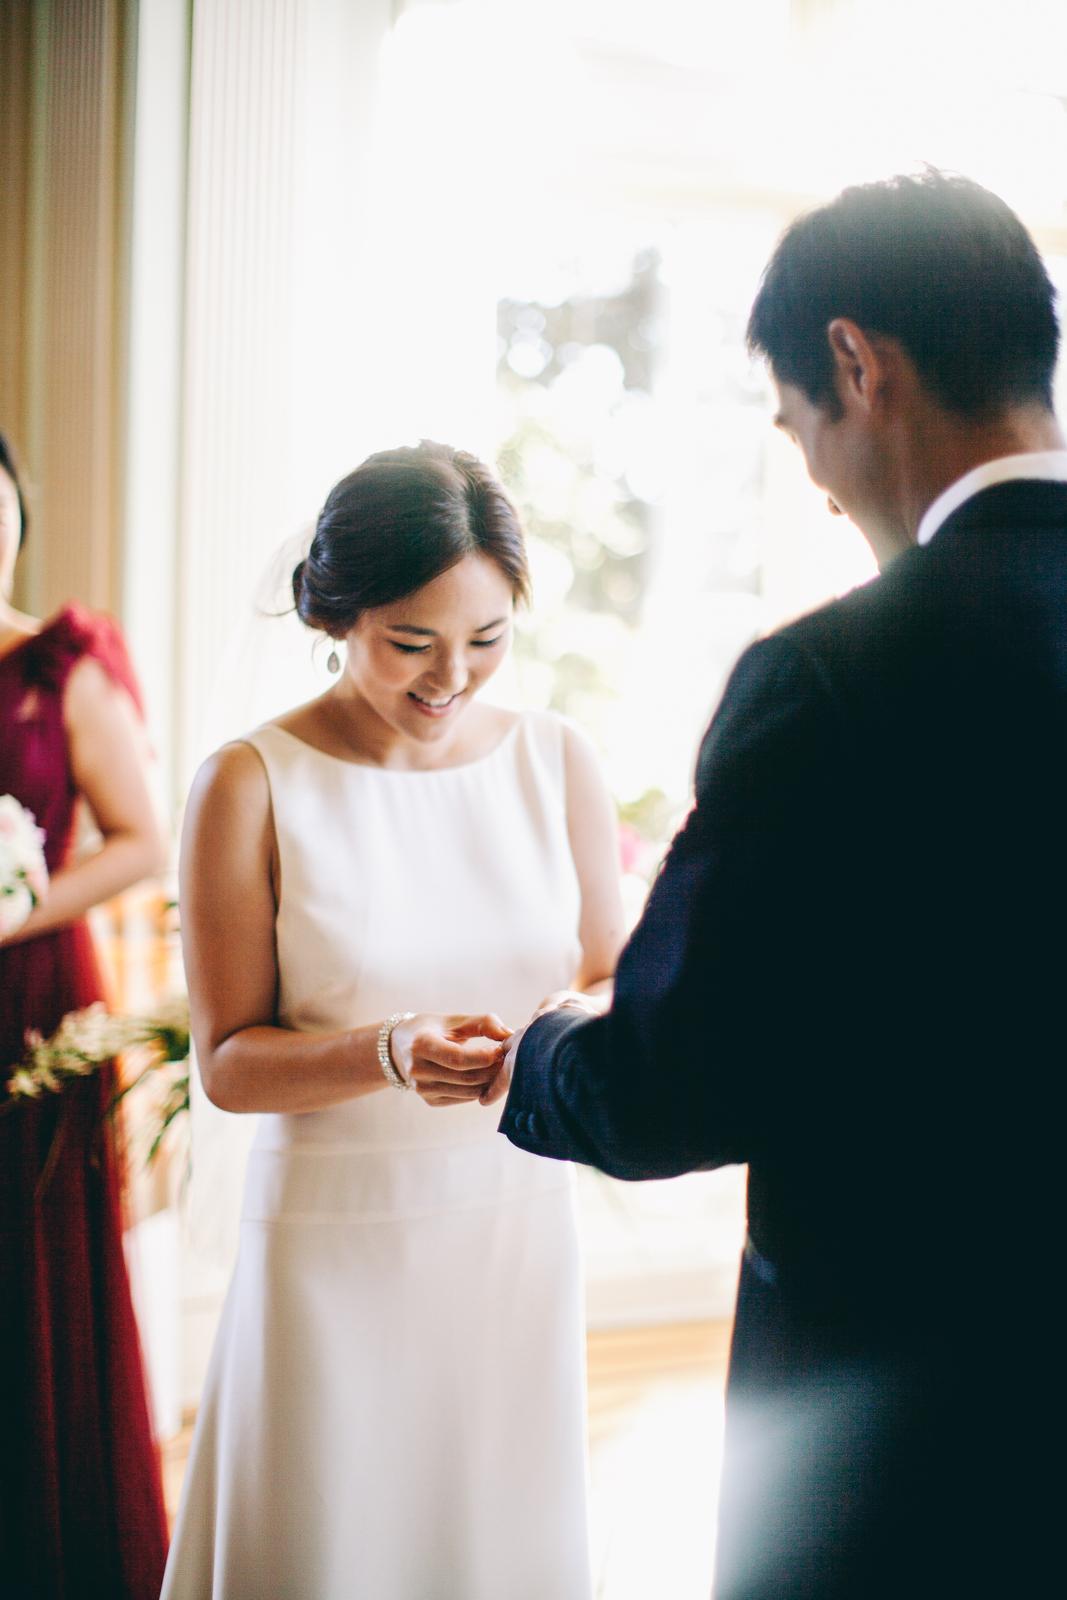 kohl_manison_wedding_photography_sarah_eric_ebony_siovhan_bokeh_photography_046.jpg